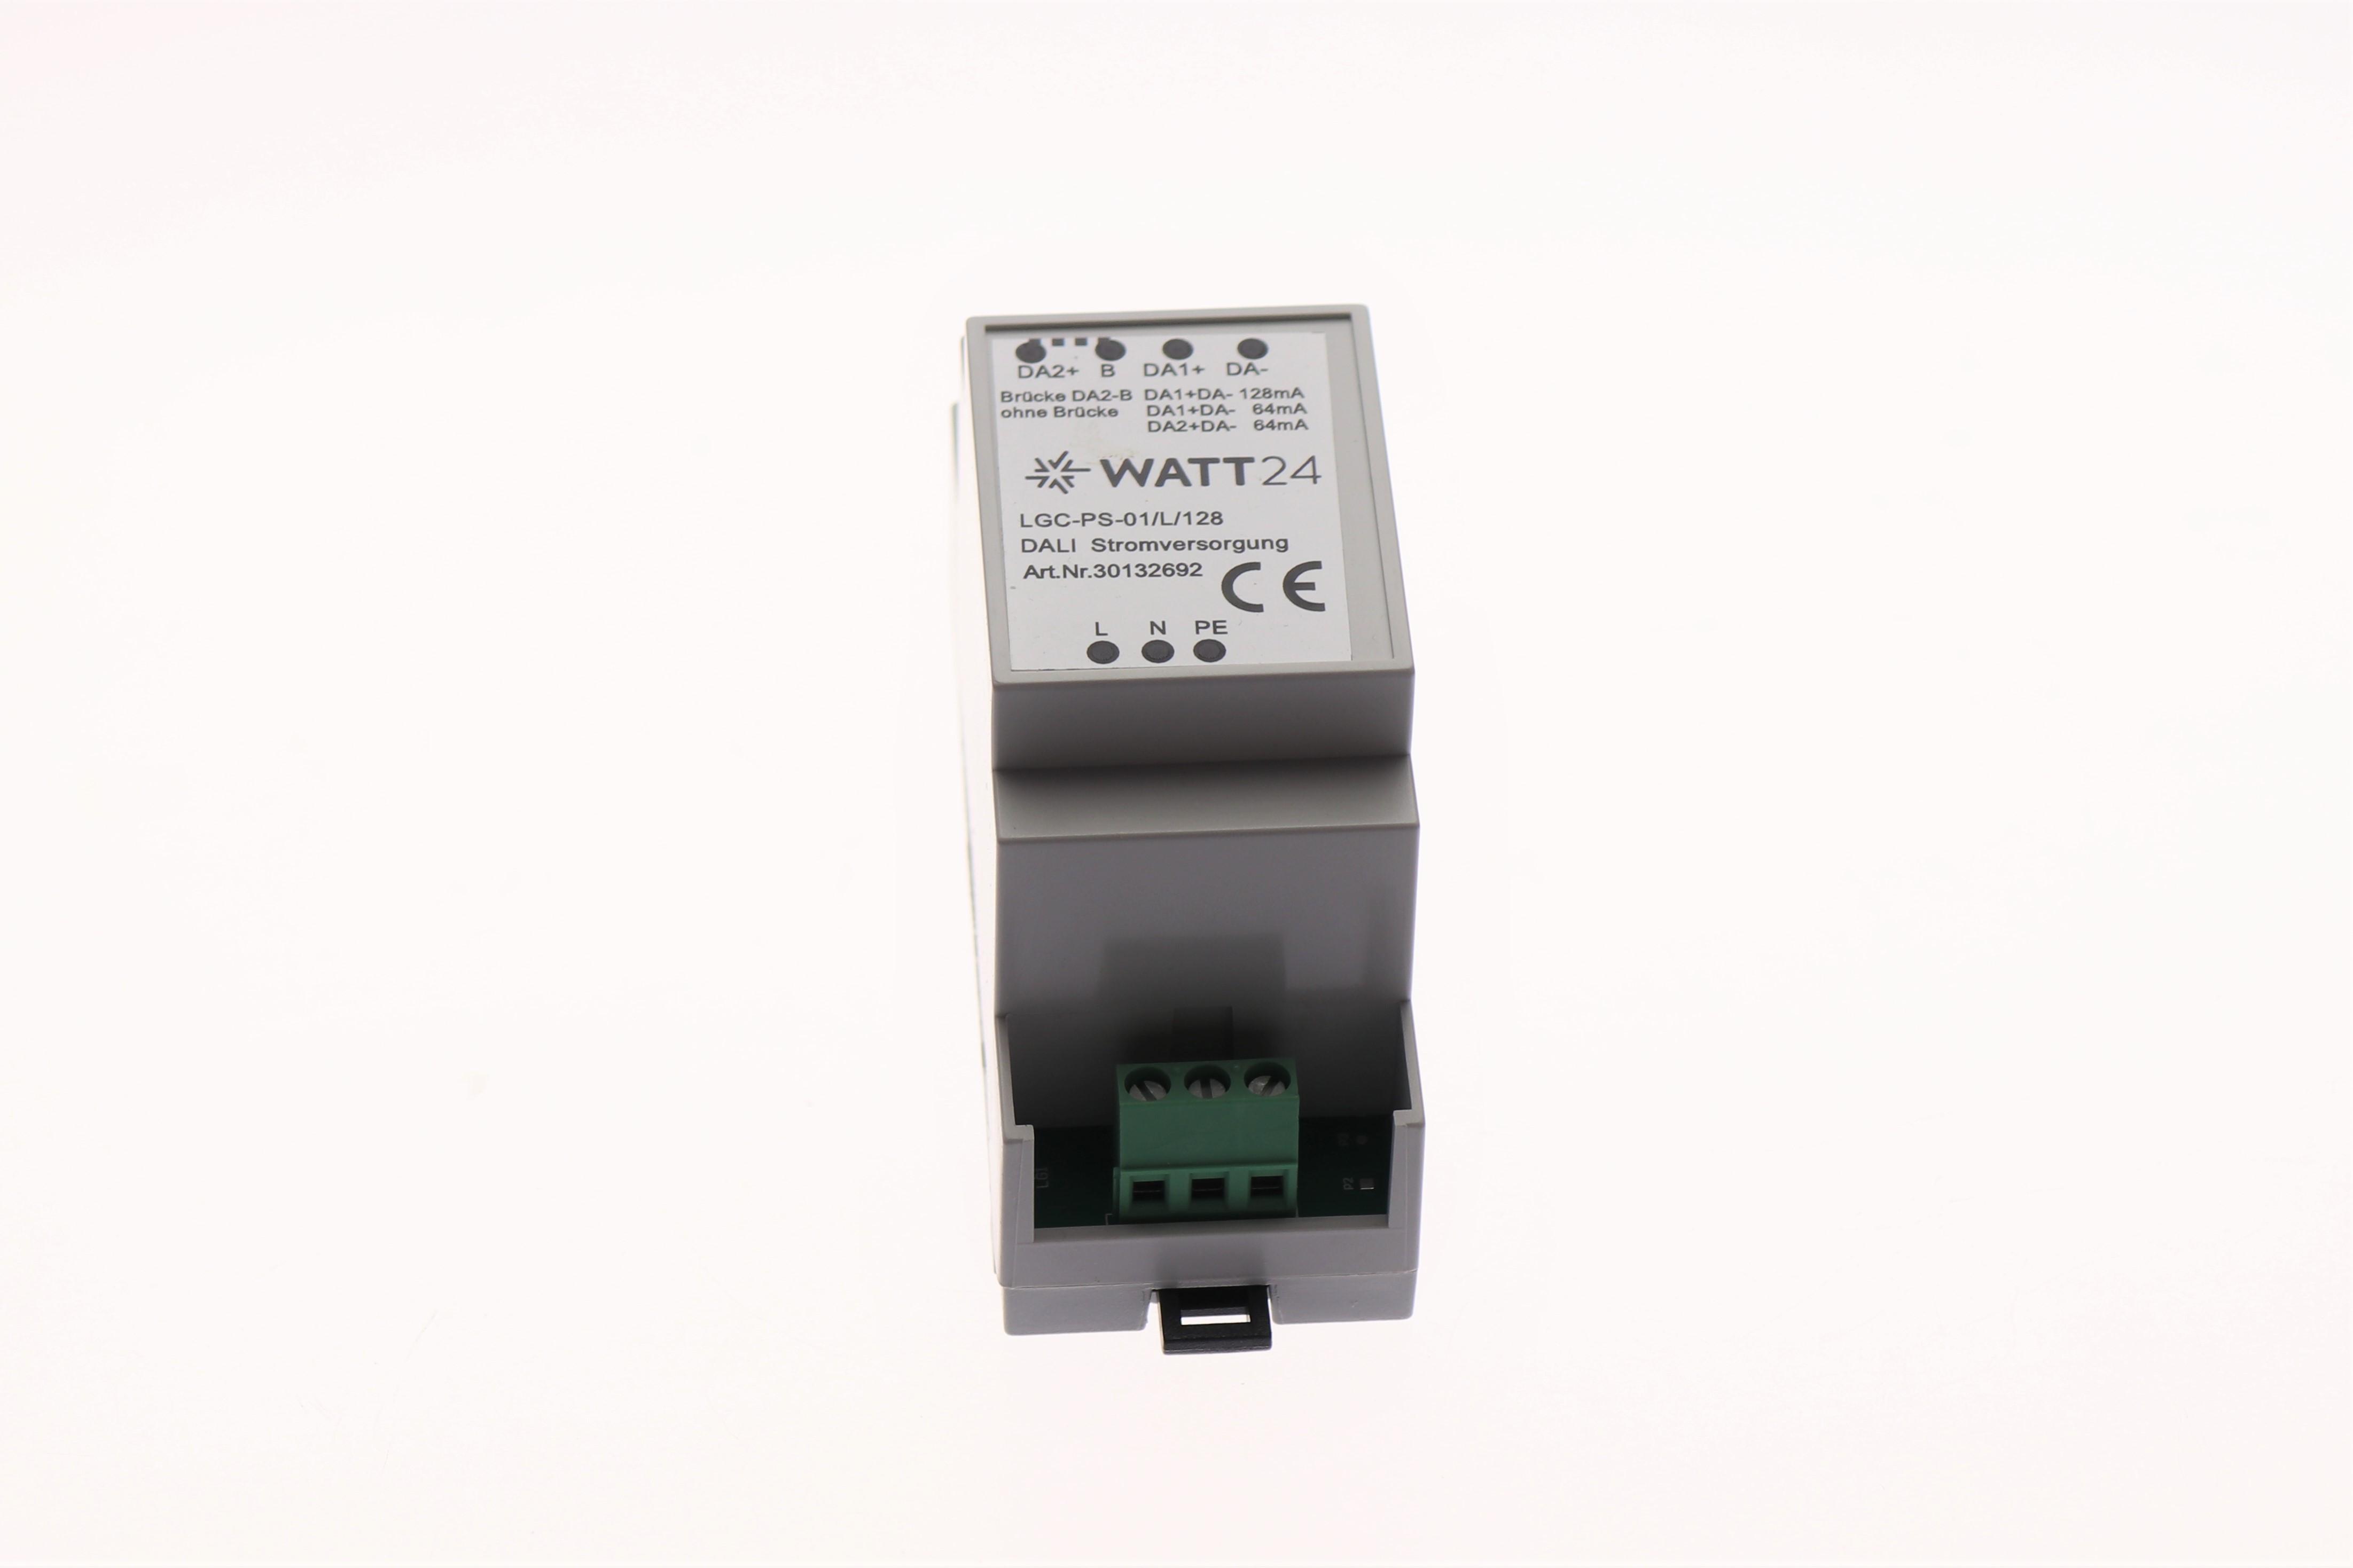 WATT24 DALI Stromversorgung PS 64mA /128mA f. Hutschiene LGS-PS01/L/128